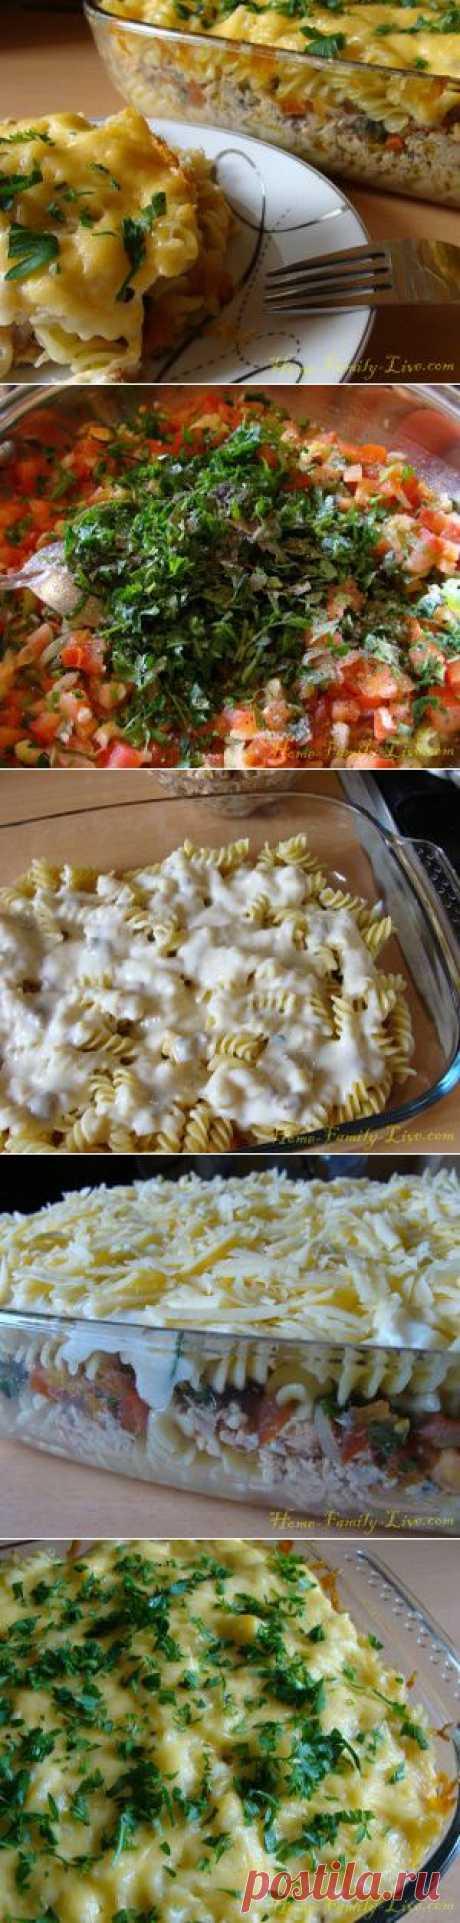 Макаронная запеканка - Кулинарные рецепты